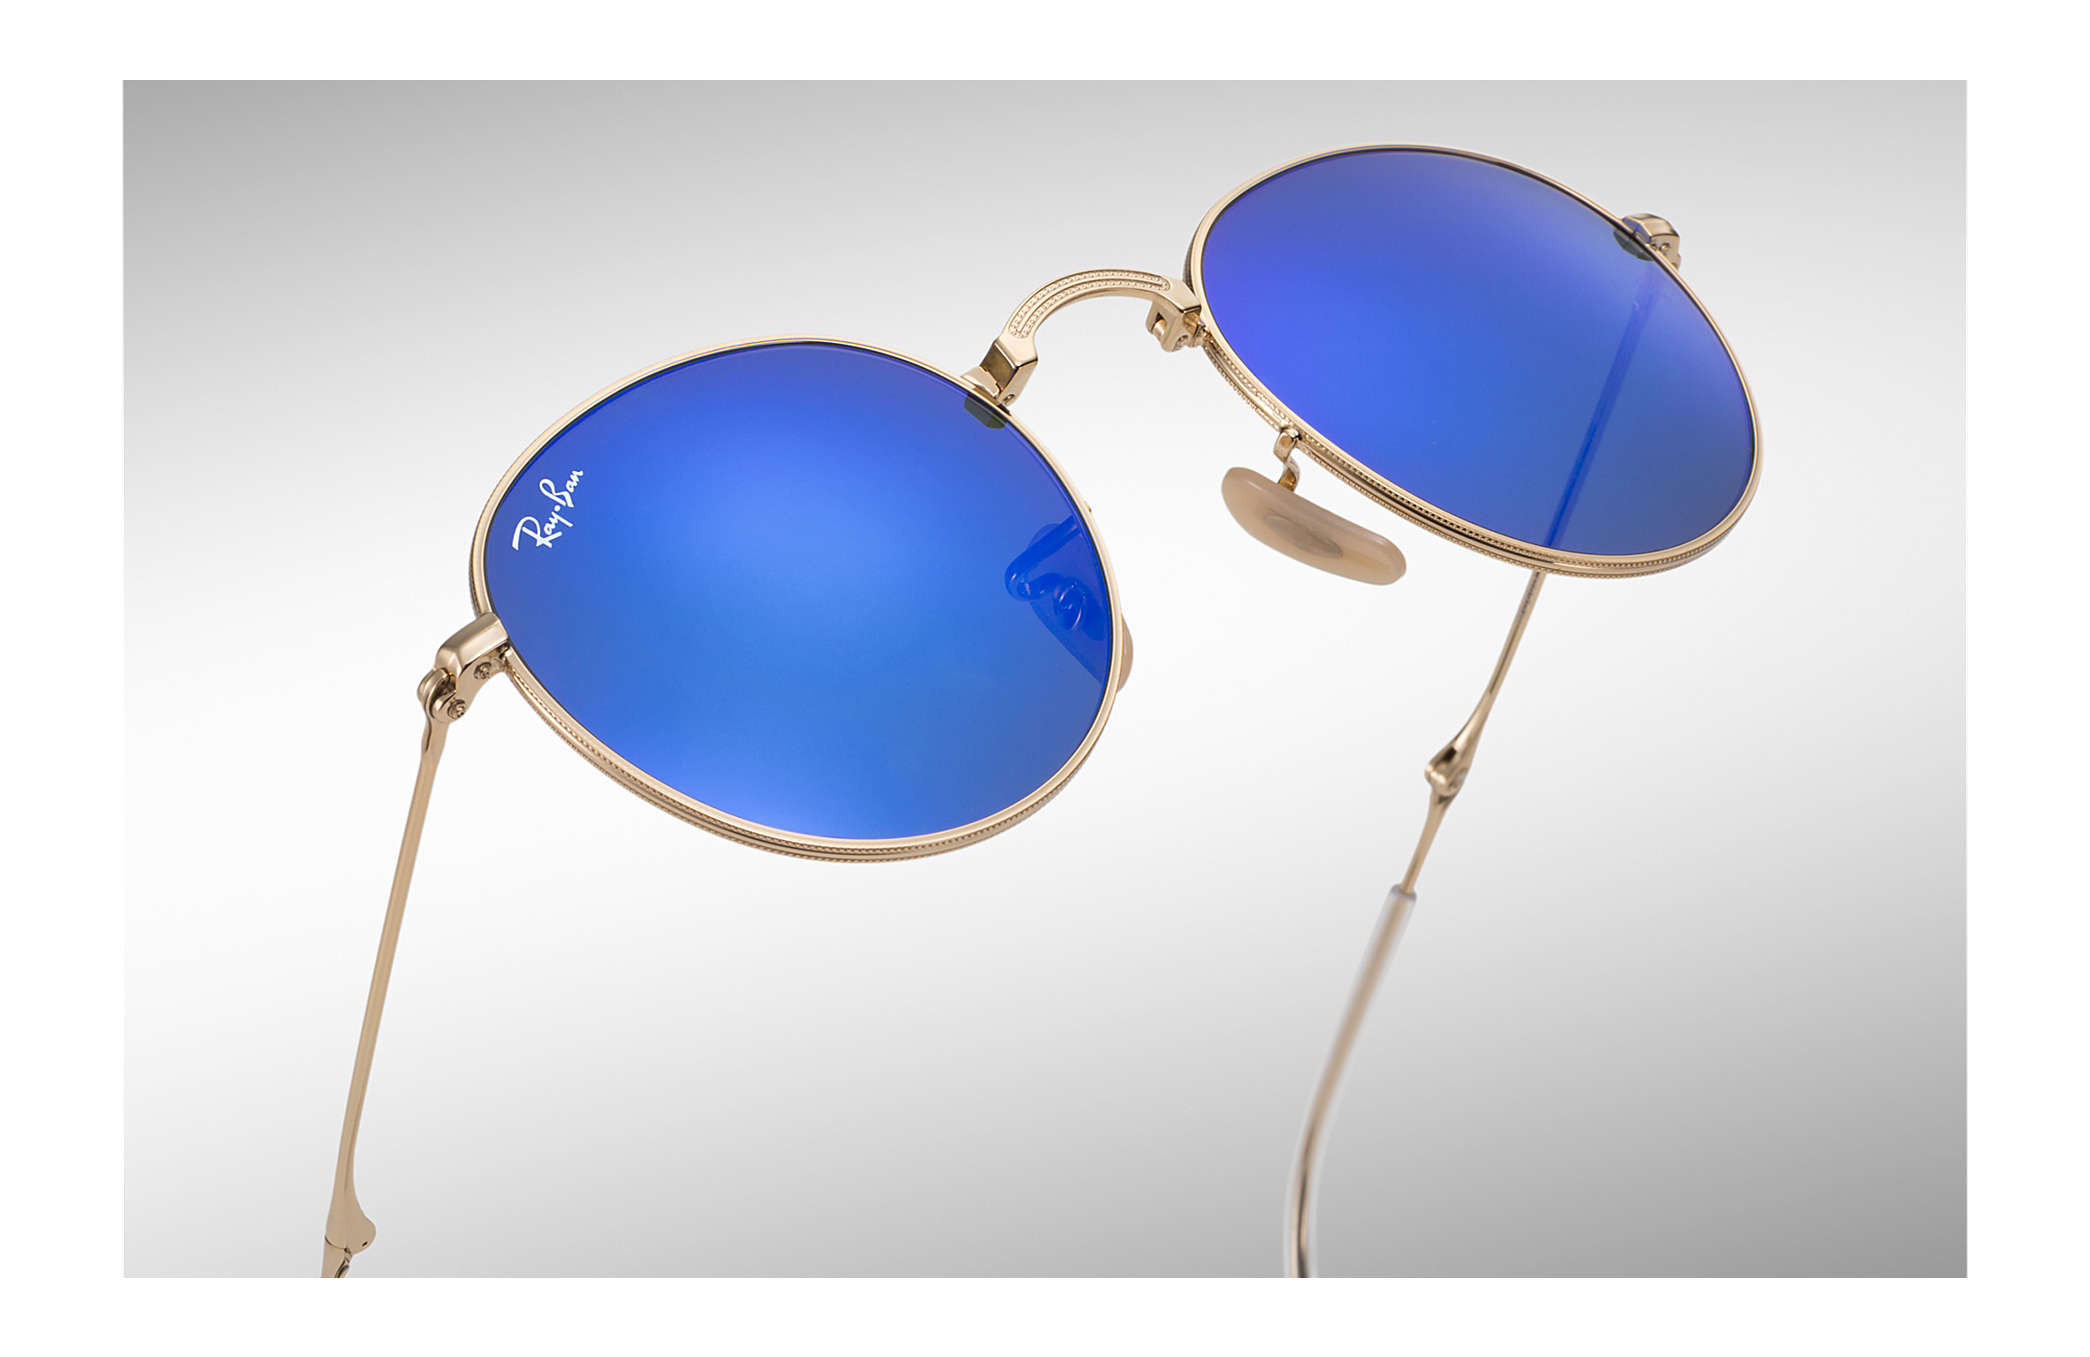 0340e19f86 Ray-Ban Round Metal Folding RB3532 Gold - Metal - Blue Lenses ...